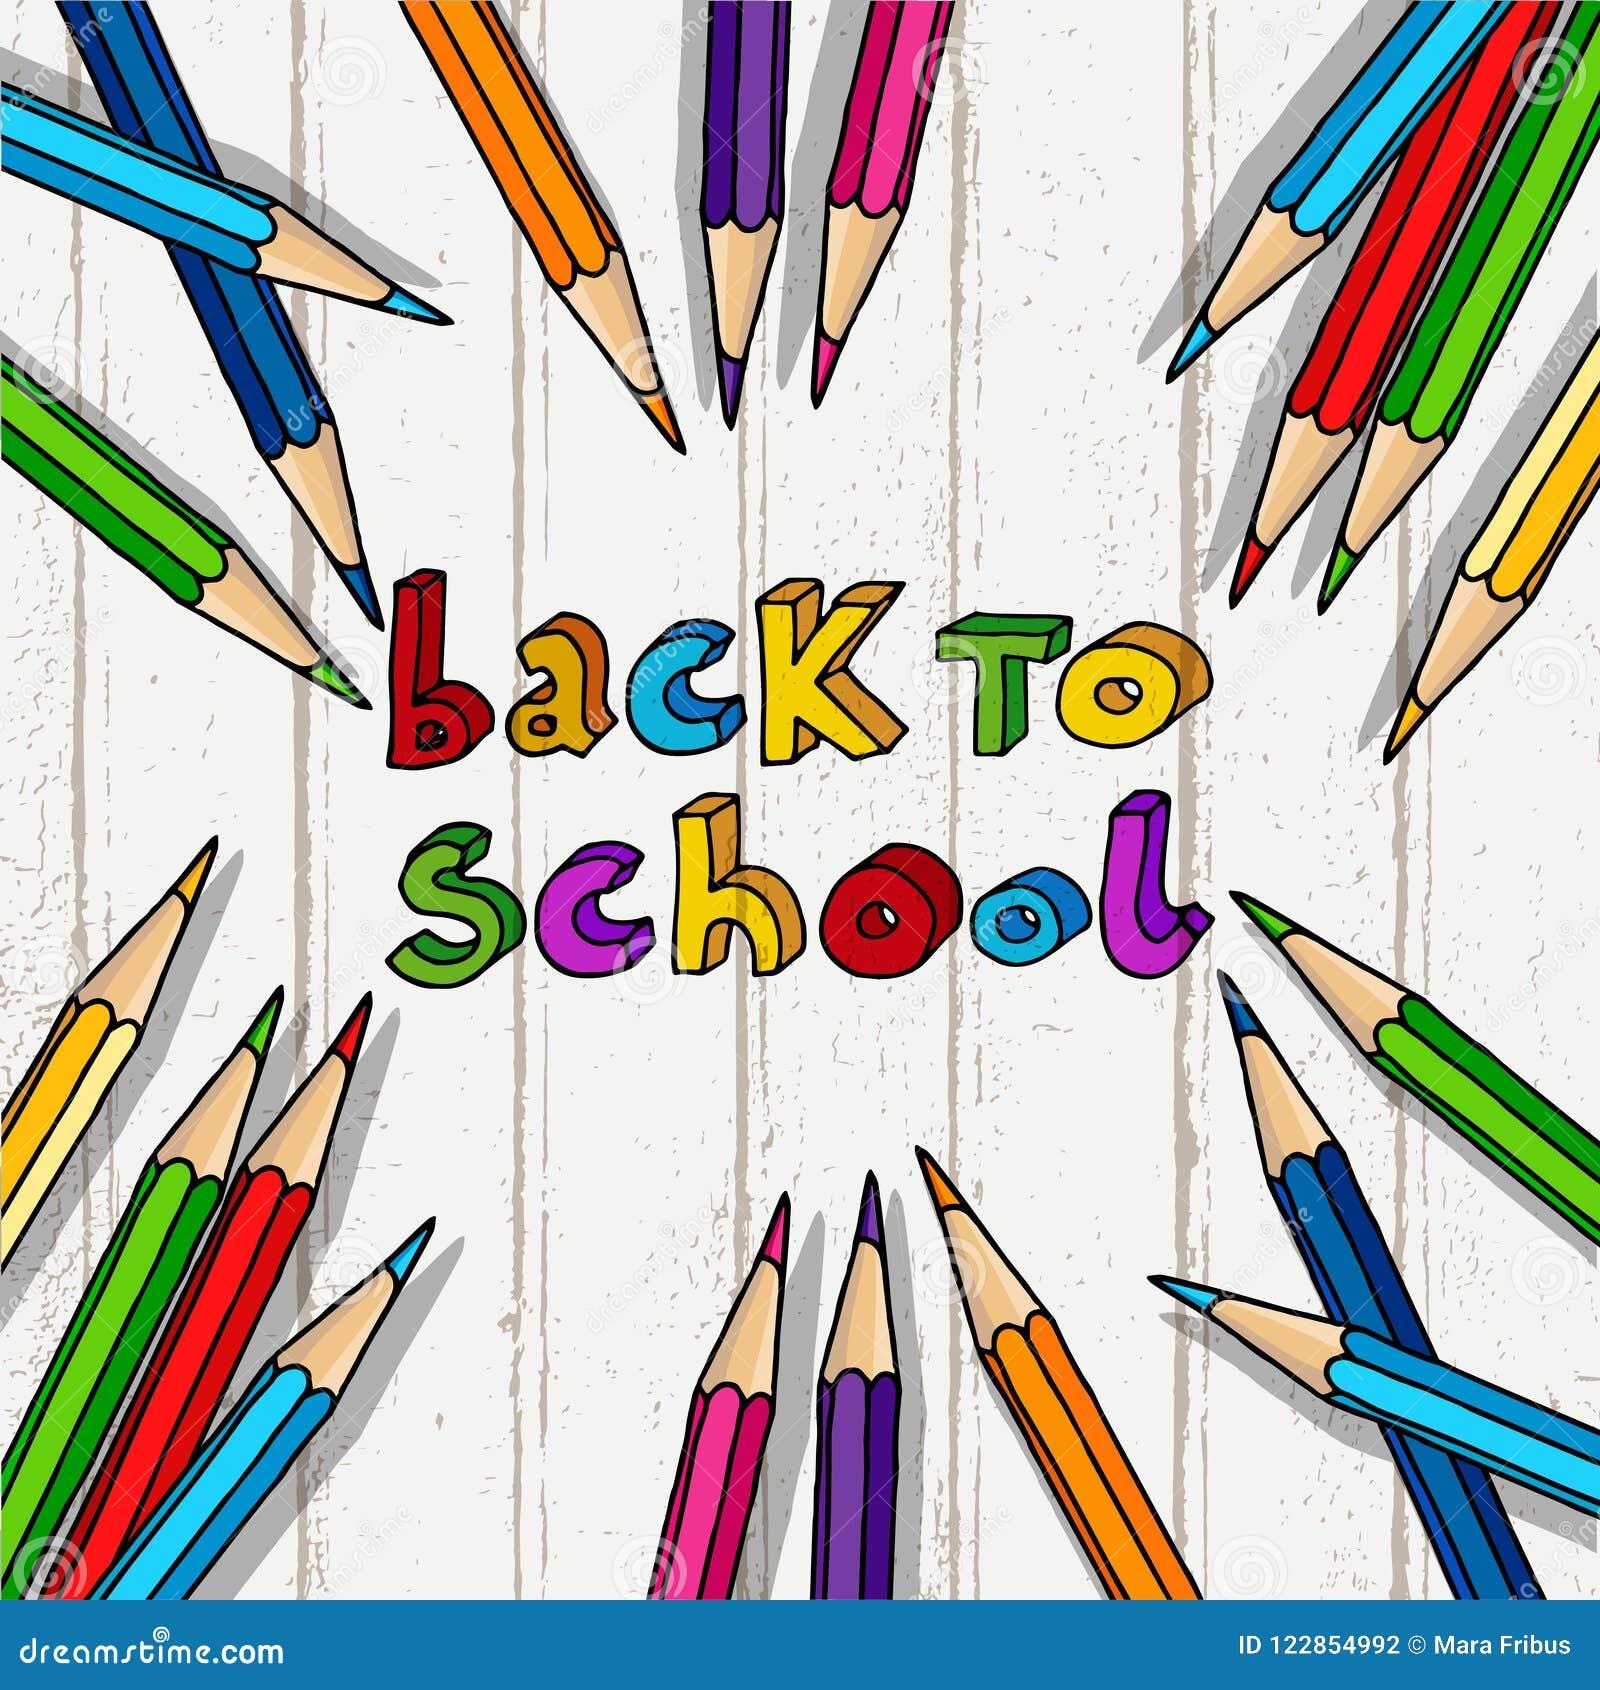 Back To School Greetings Stock Vector Illustration Of Celebration